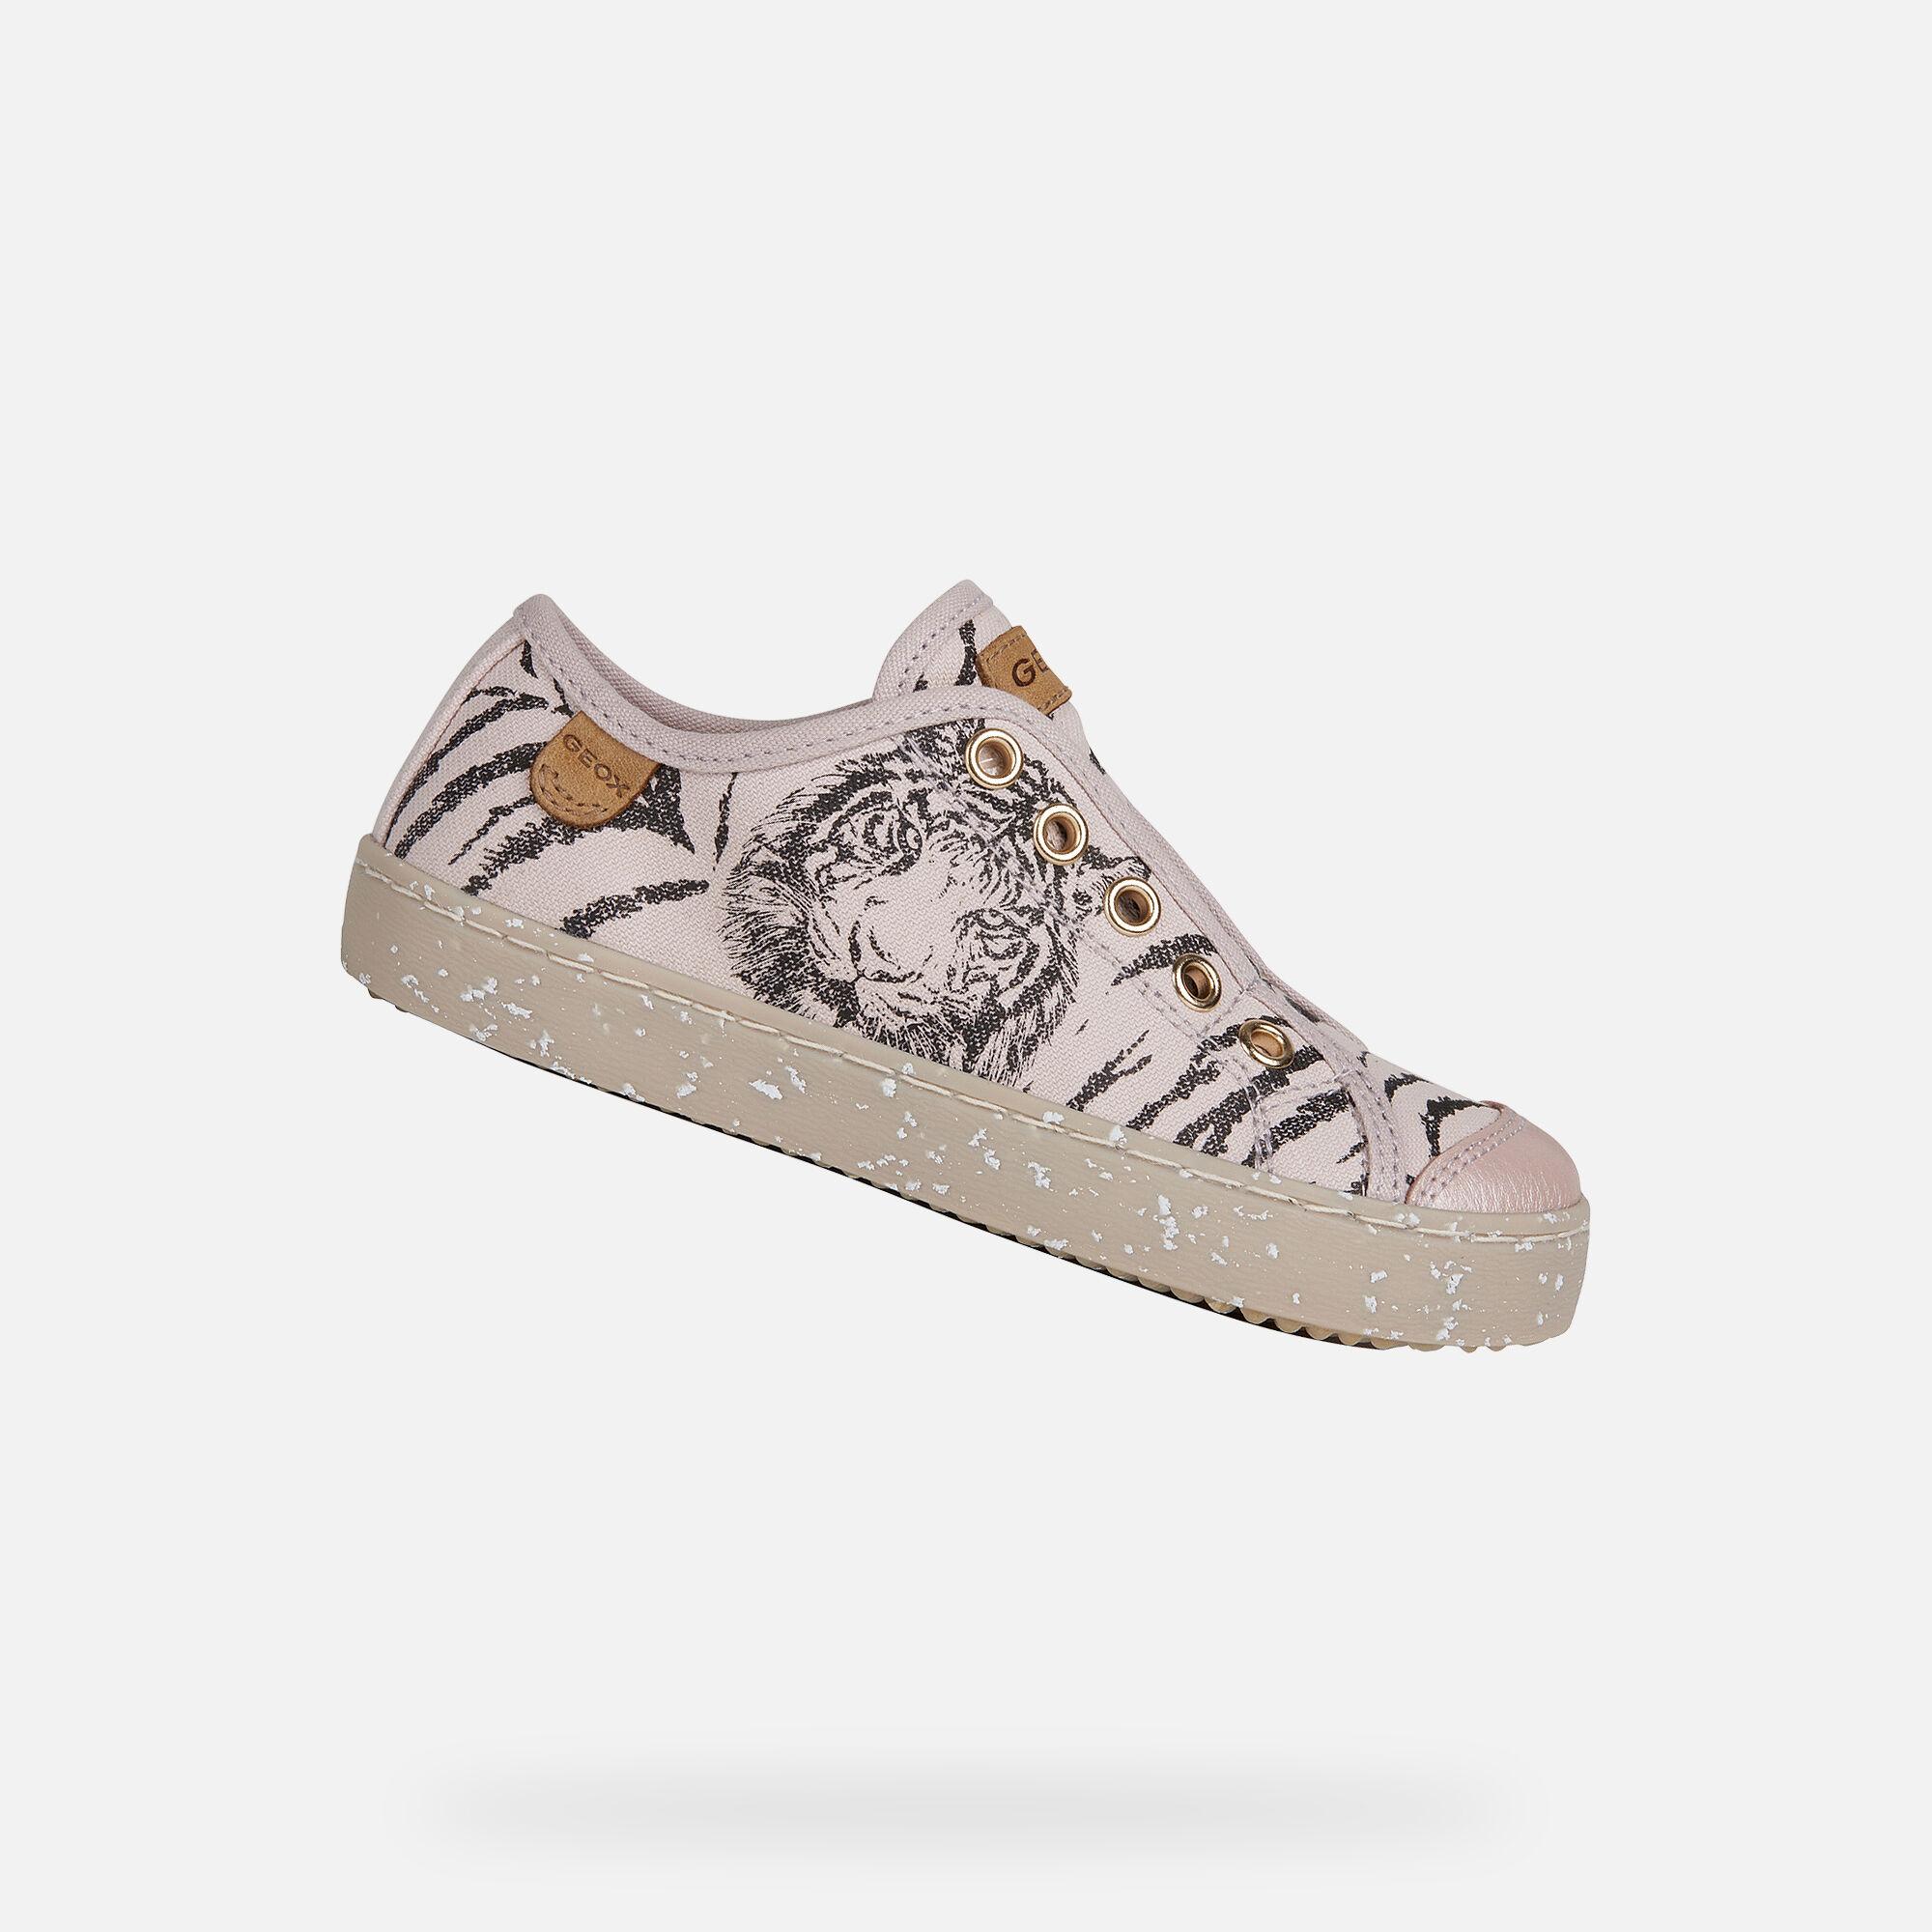 Geox KILWI Girl: Rose Sneakers   Geox SS20